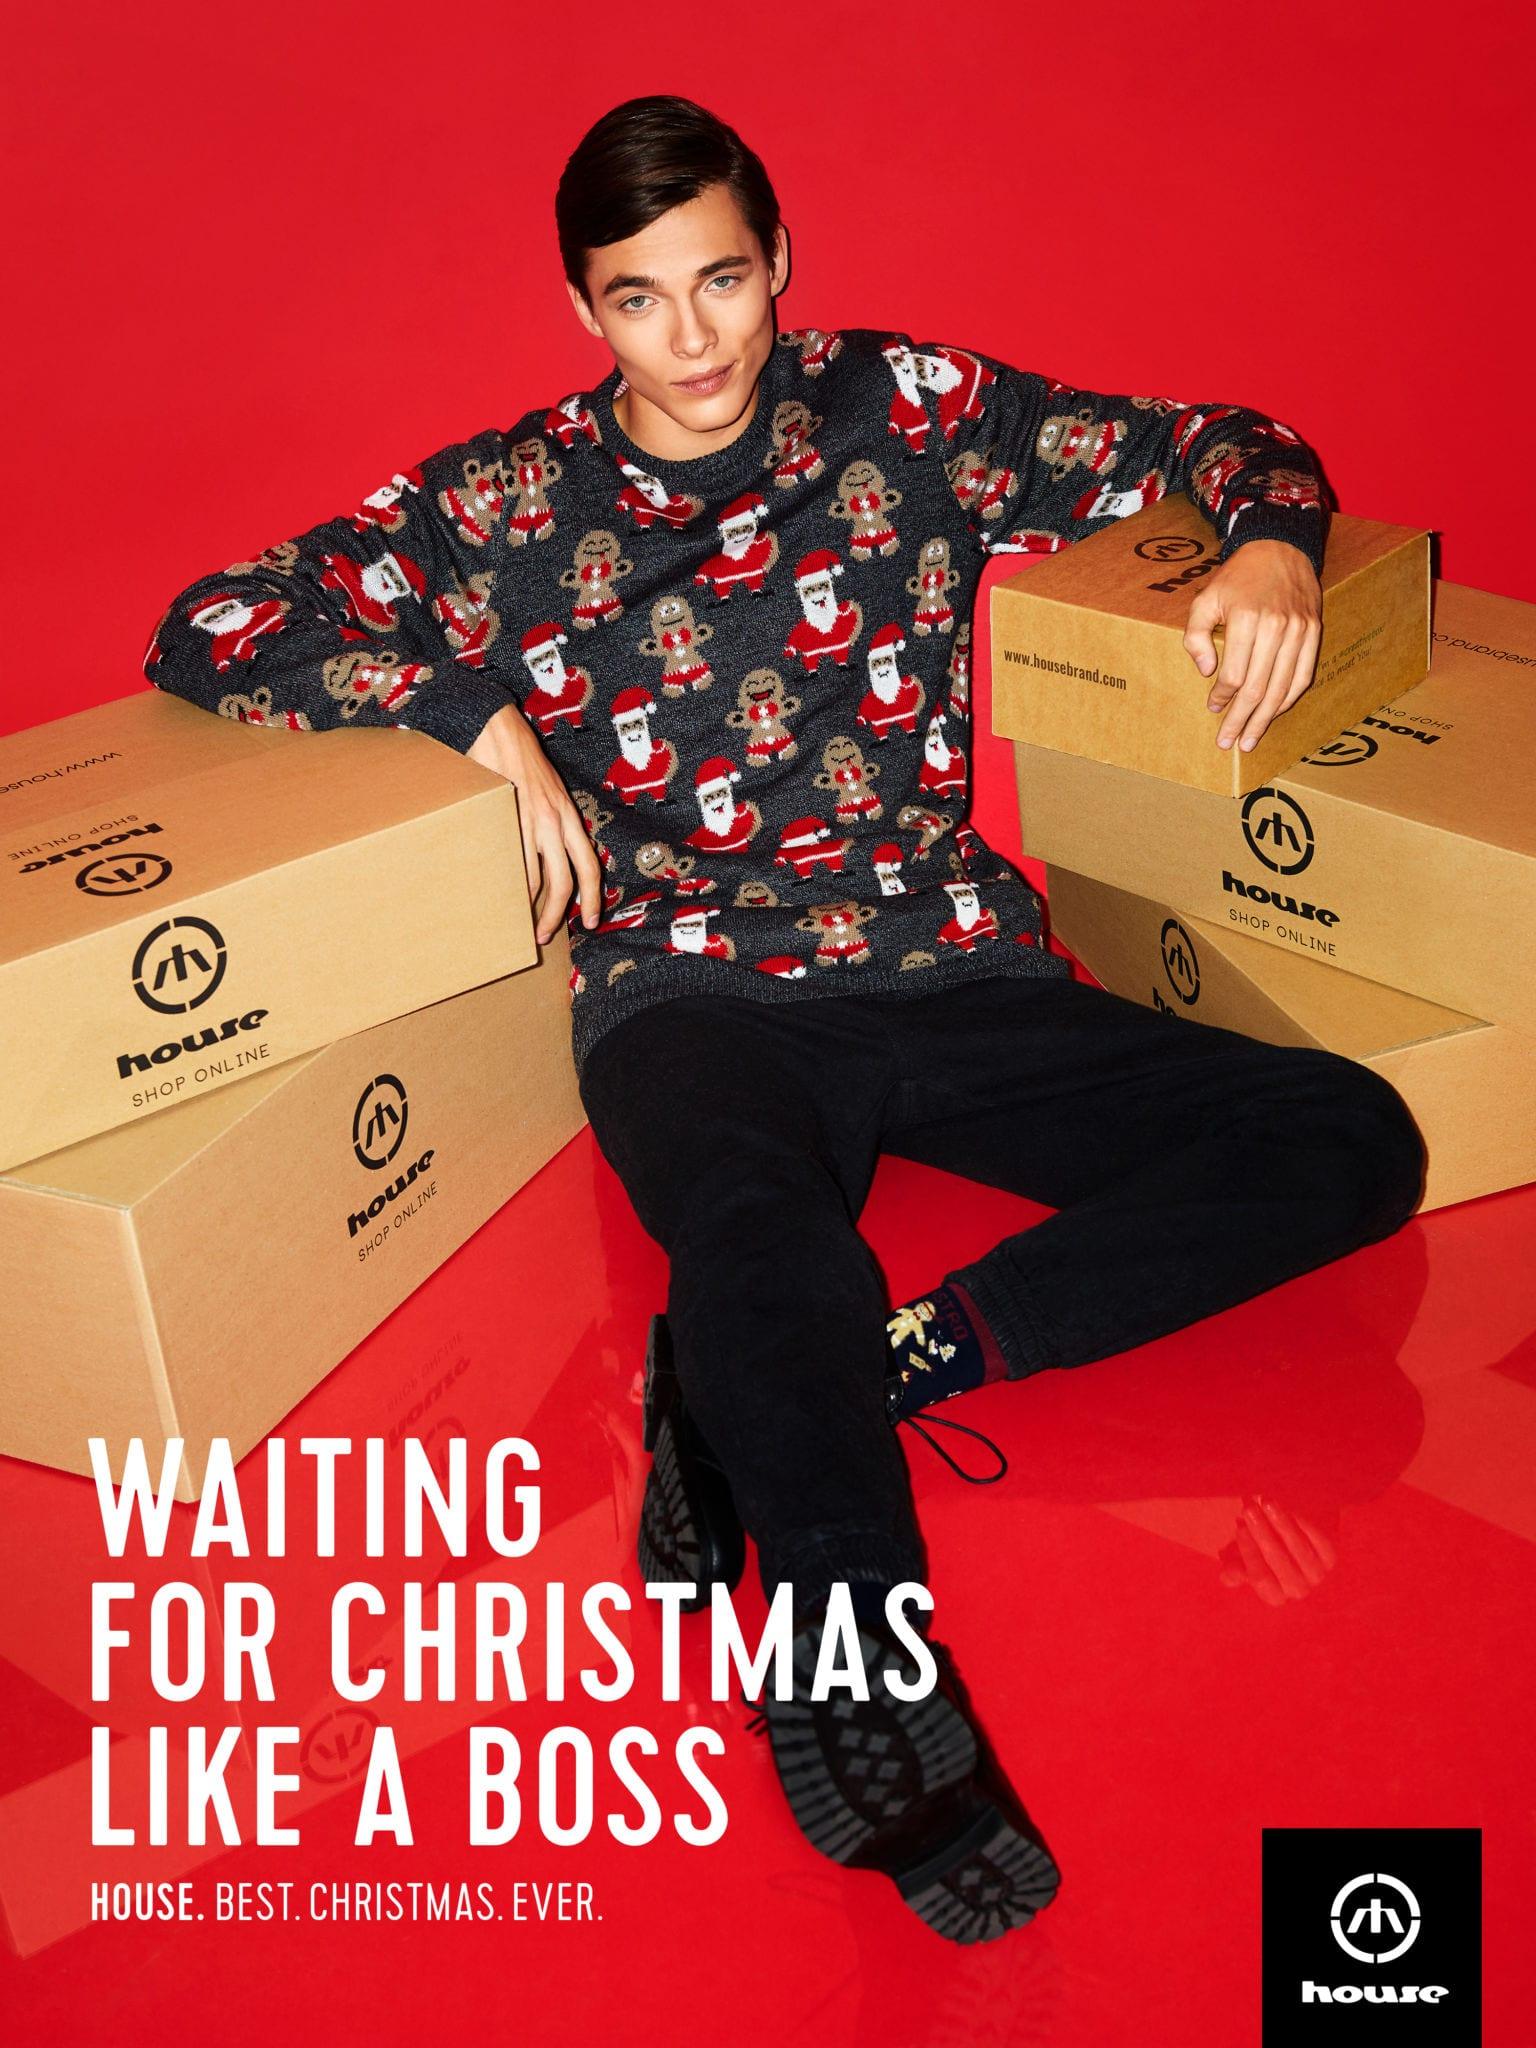 BEST. CHRISTMAS. EVER. - House (9)